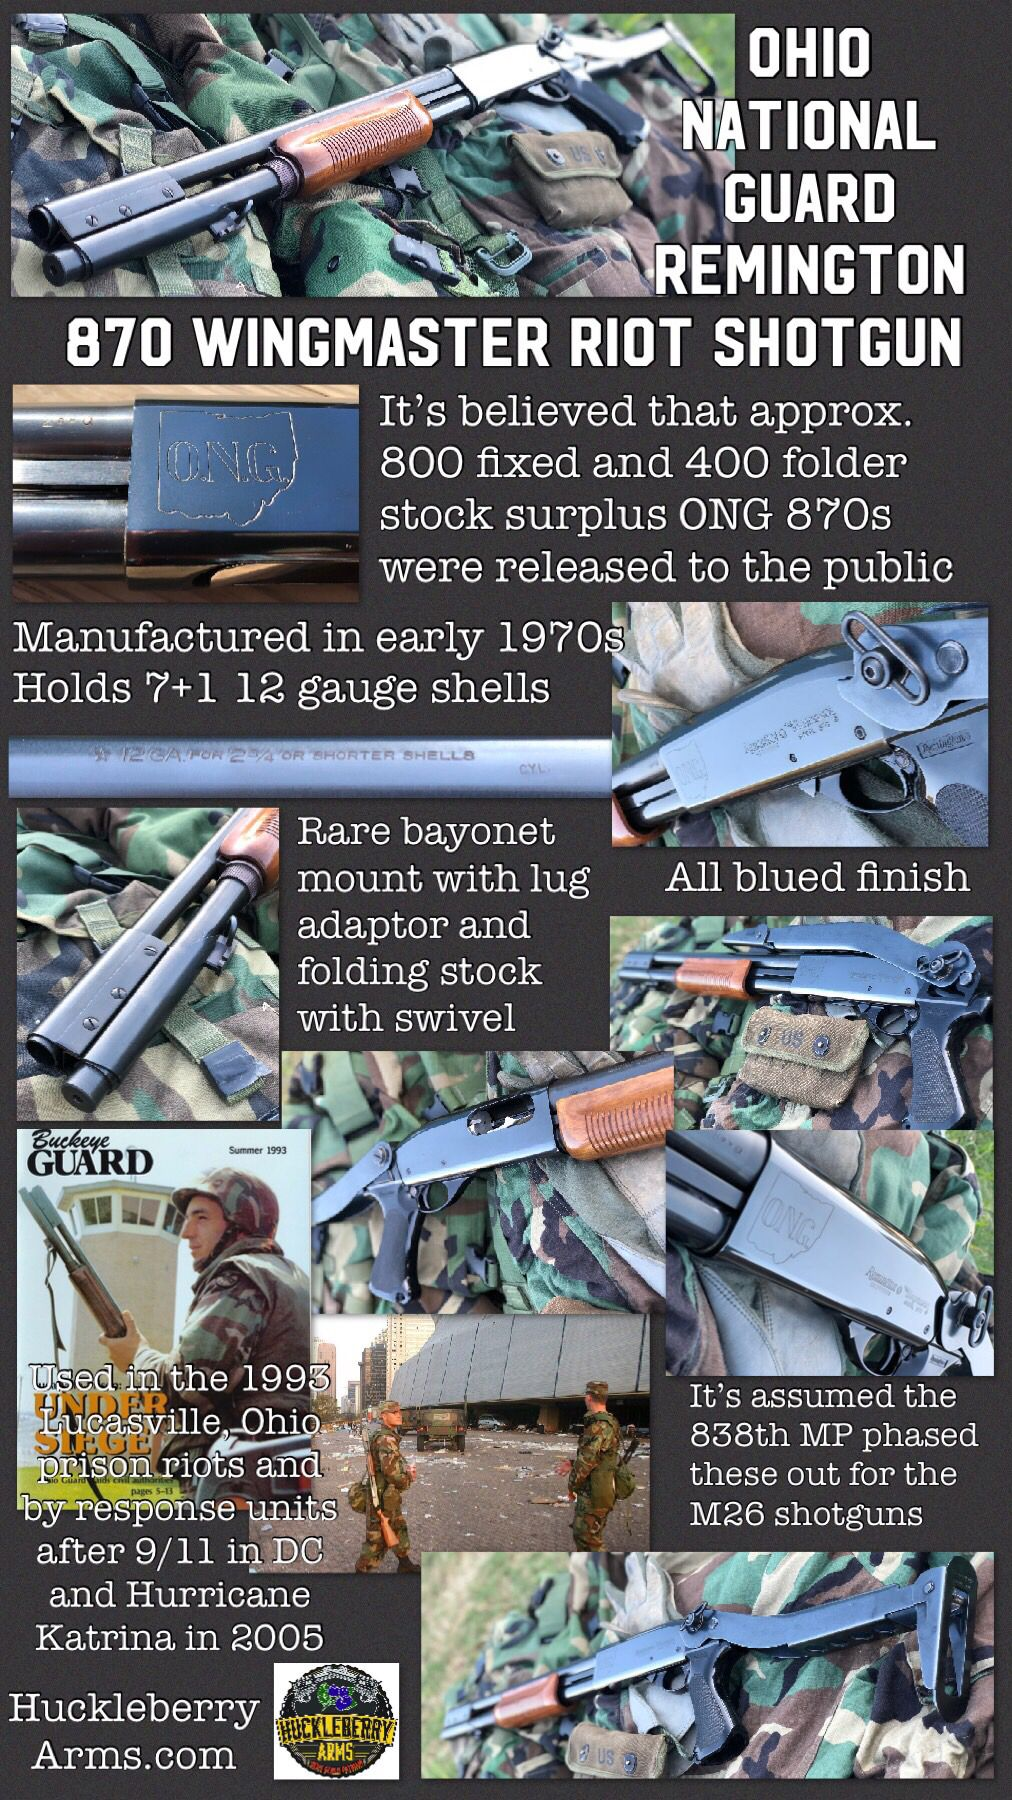 Ohio National Guard Remington 870 Wingmaster Riot Shotgun With Info Shotguns Remingtonshotguns Remington870 Remington870diagram Rare Follow Us For More